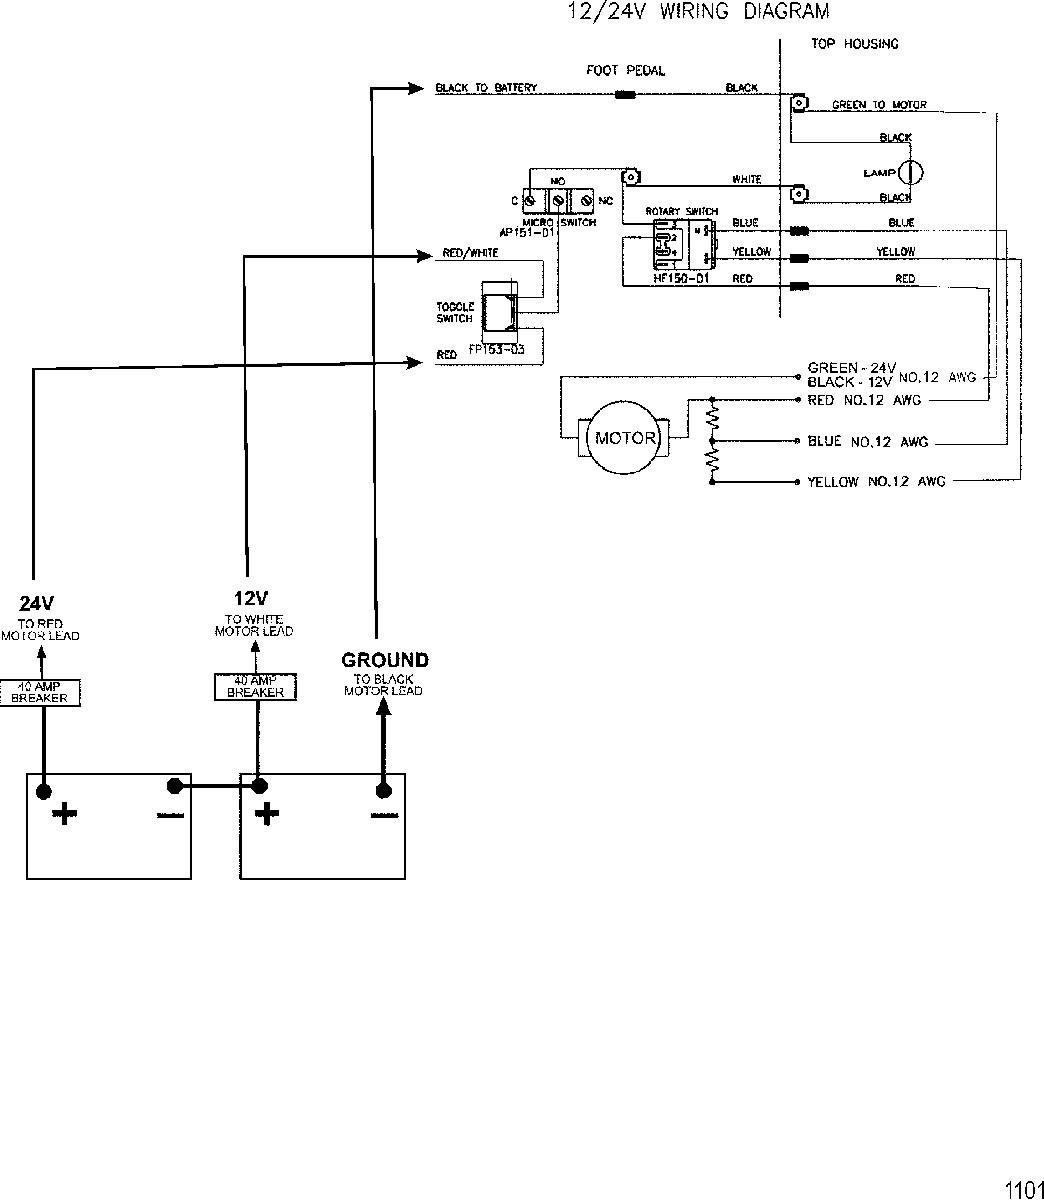 minn kota 5 speed switch wiring diagram 765 motorguide wiring diagram faint fuse3 klictravel nl  765 motorguide wiring diagram faint